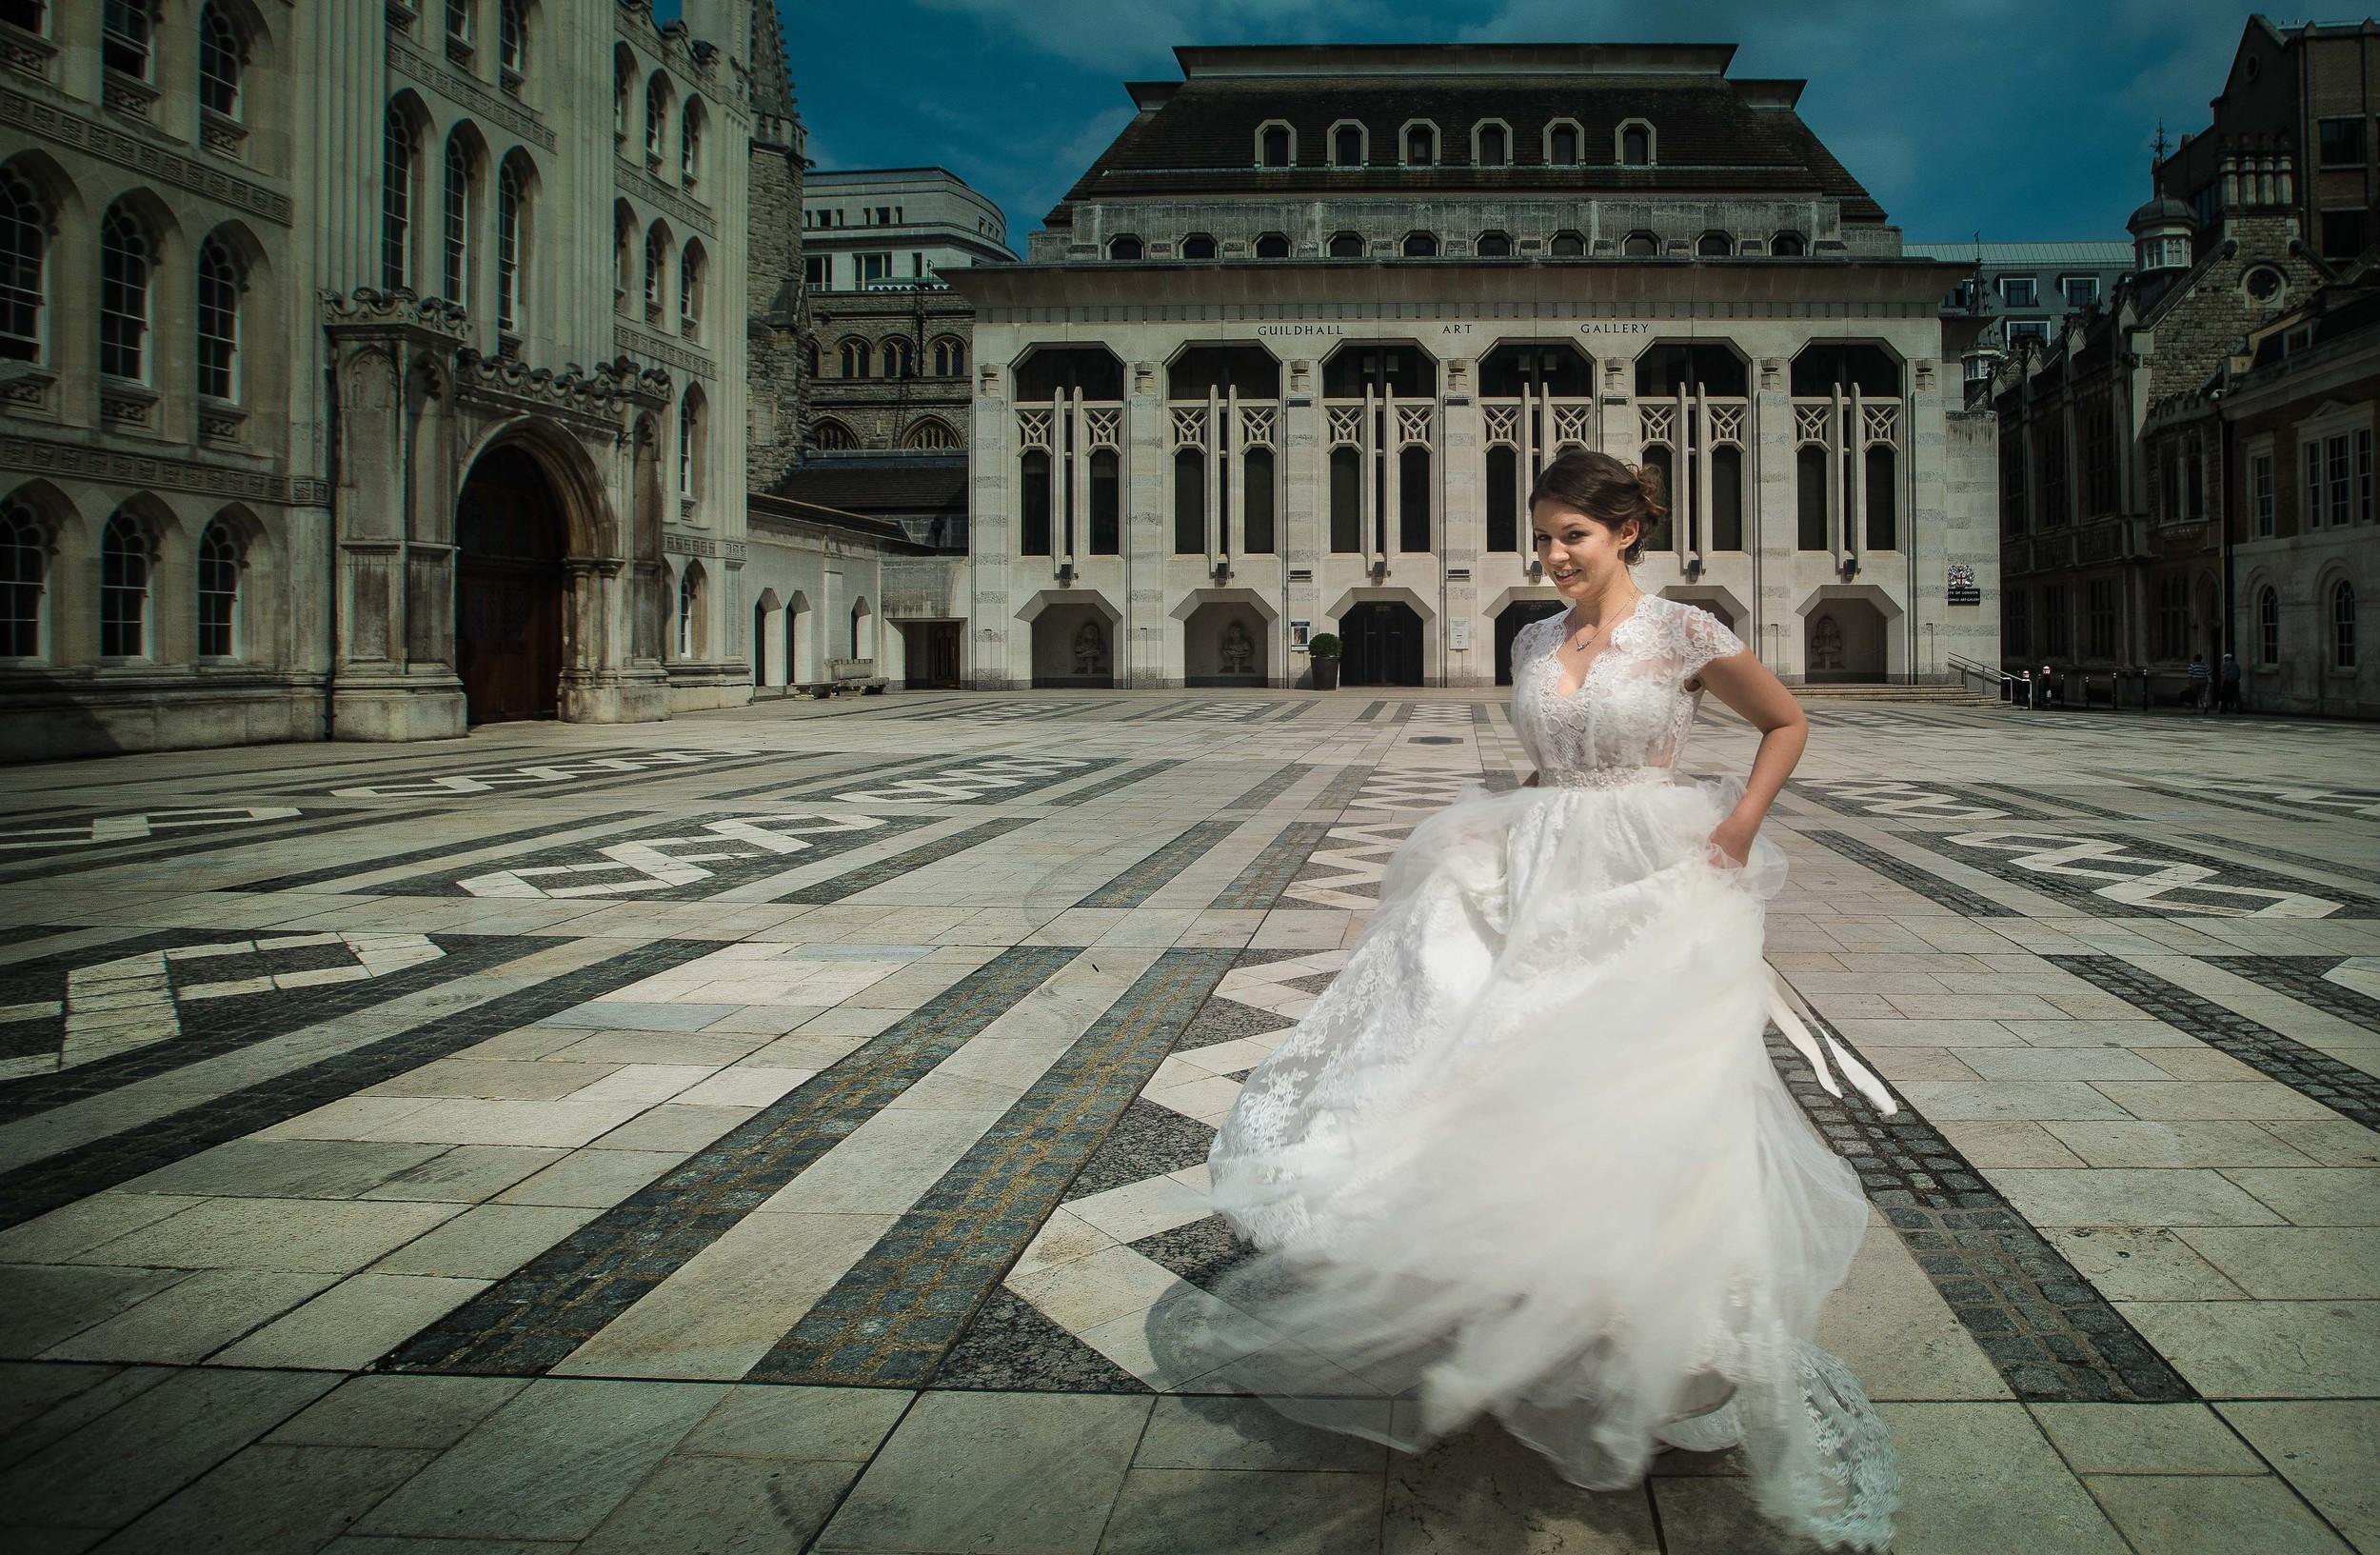 russian-bride-guildhall-london-uk-destination-wedding-photography-Adam-Rowley